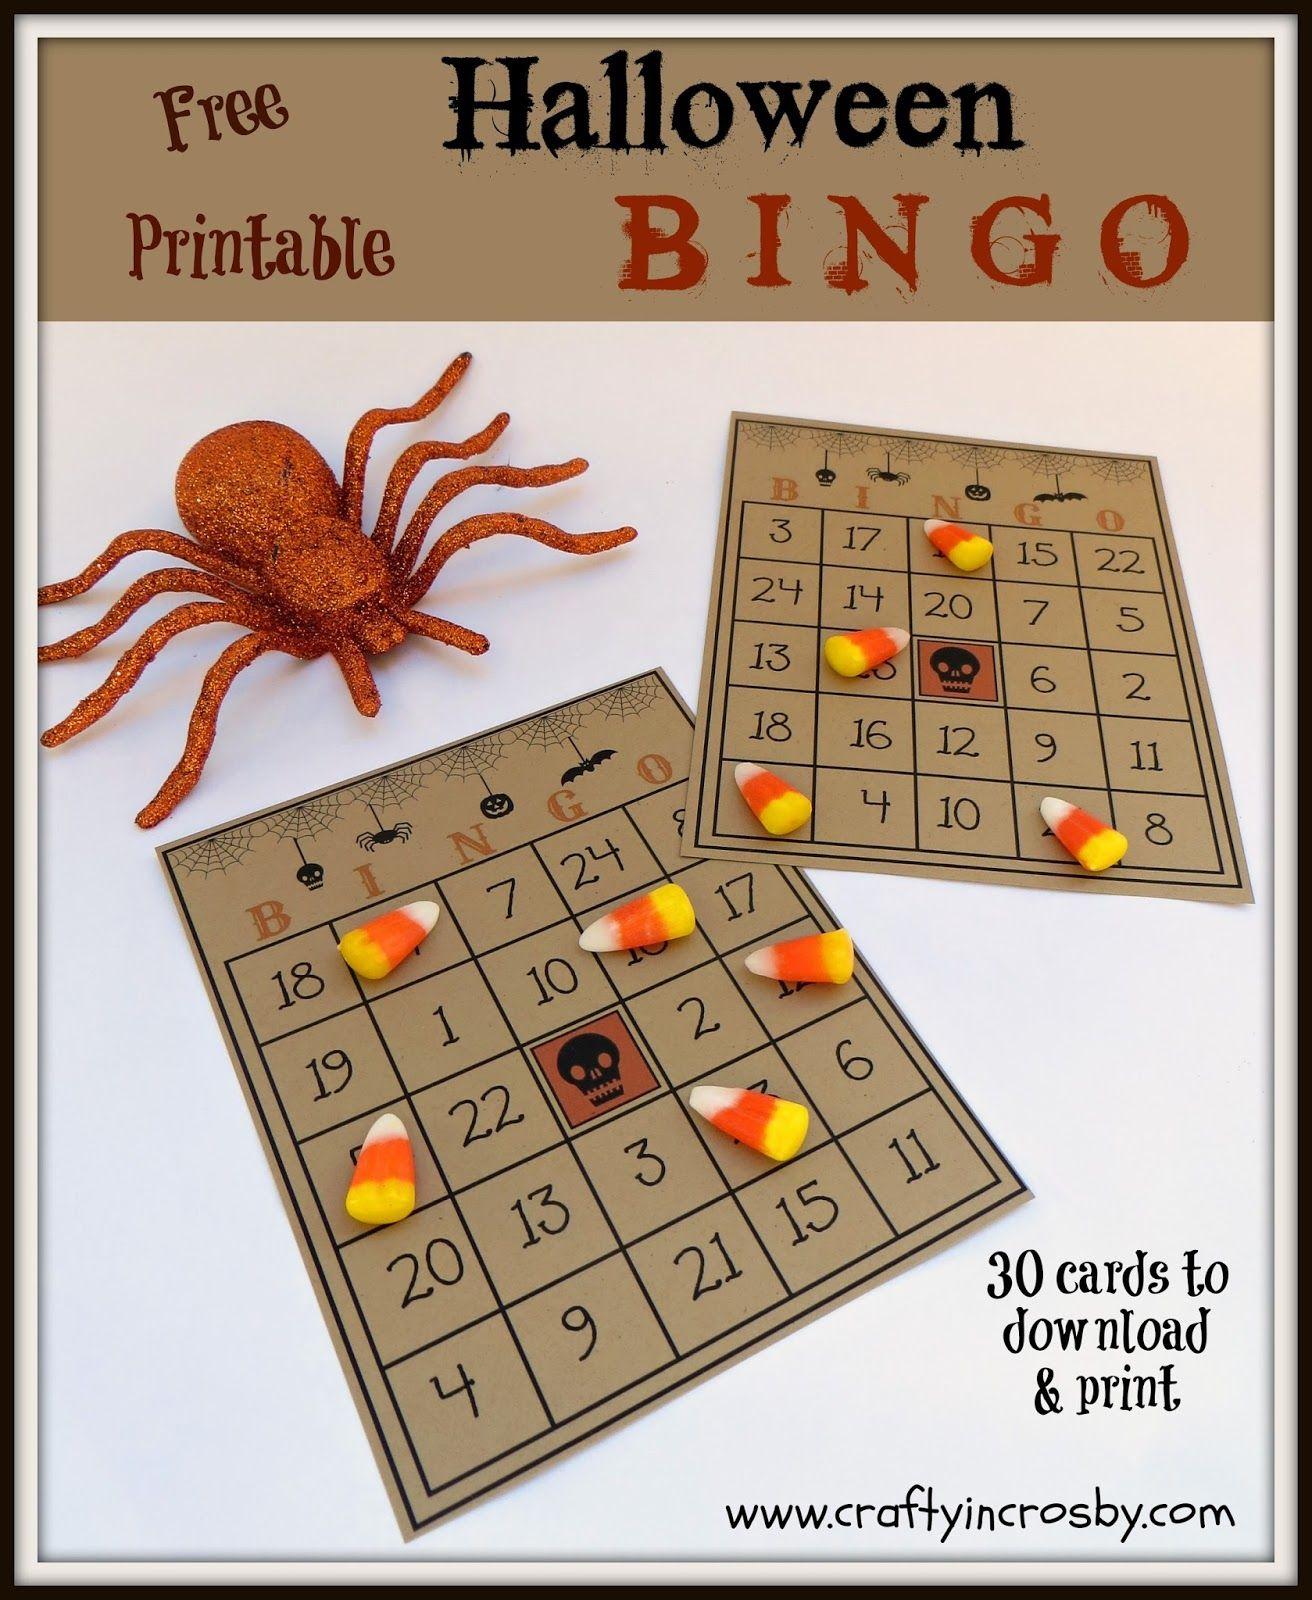 Free Printable Halloween Bingo Game With 30 Cards, Call Sheet And - Free Printable Bingo Cards And Call Sheet